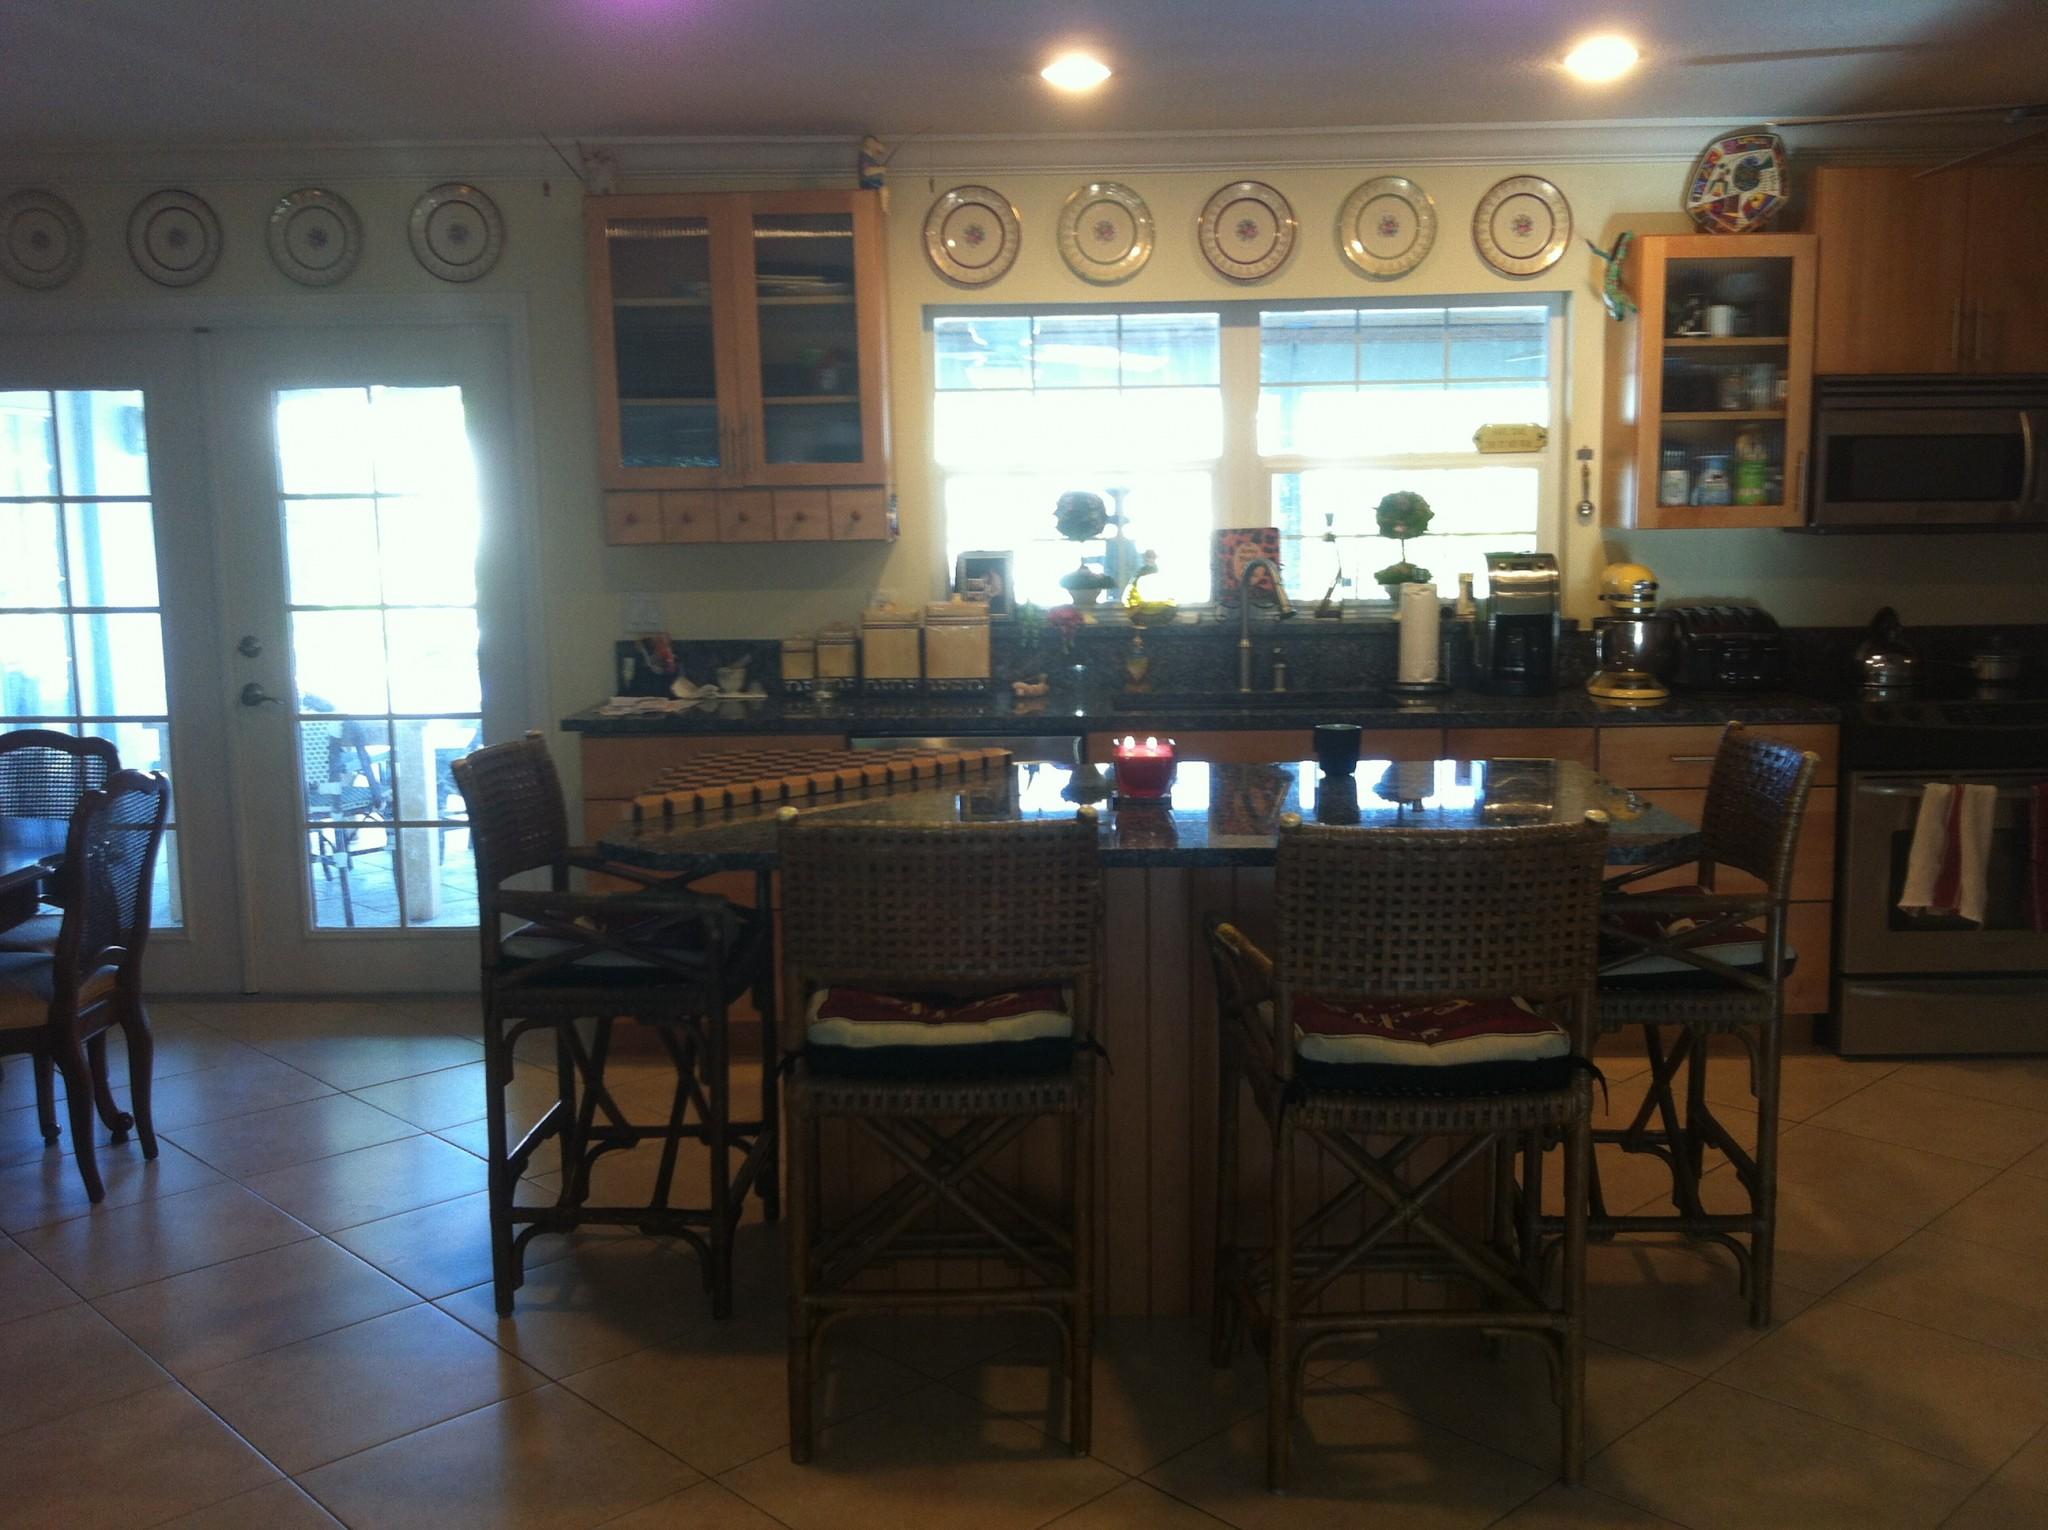 Patty's kitchen before